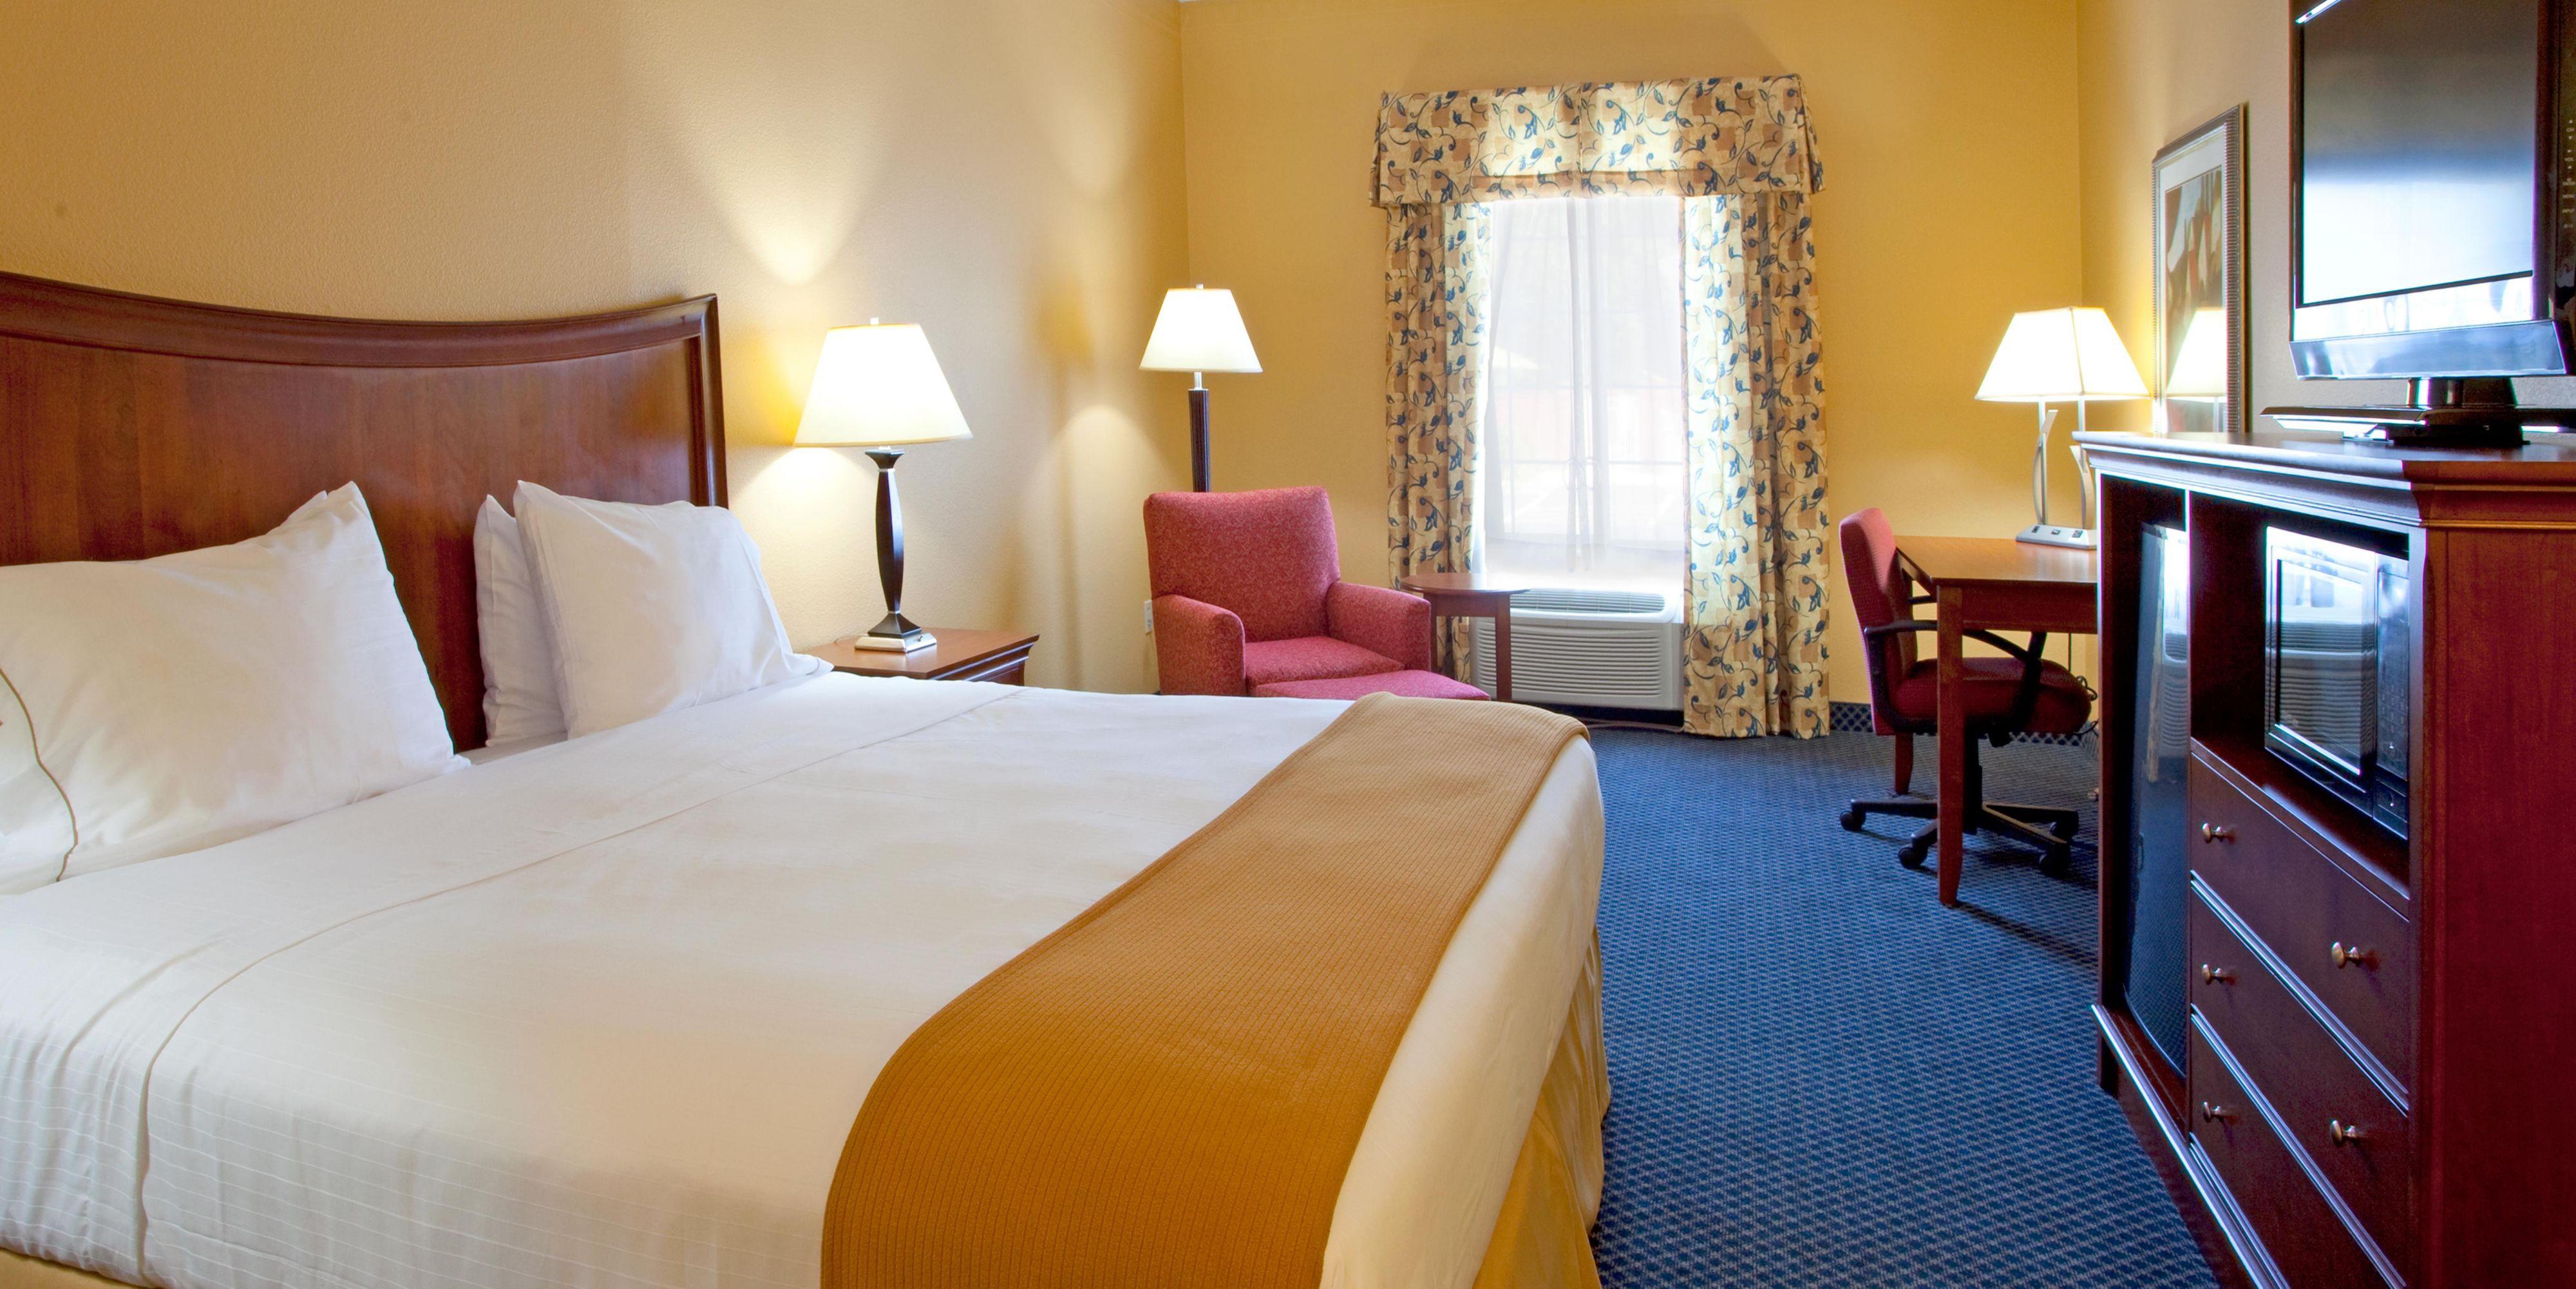 Holiday Inn Express Port Wentworth 4306305502 2x1